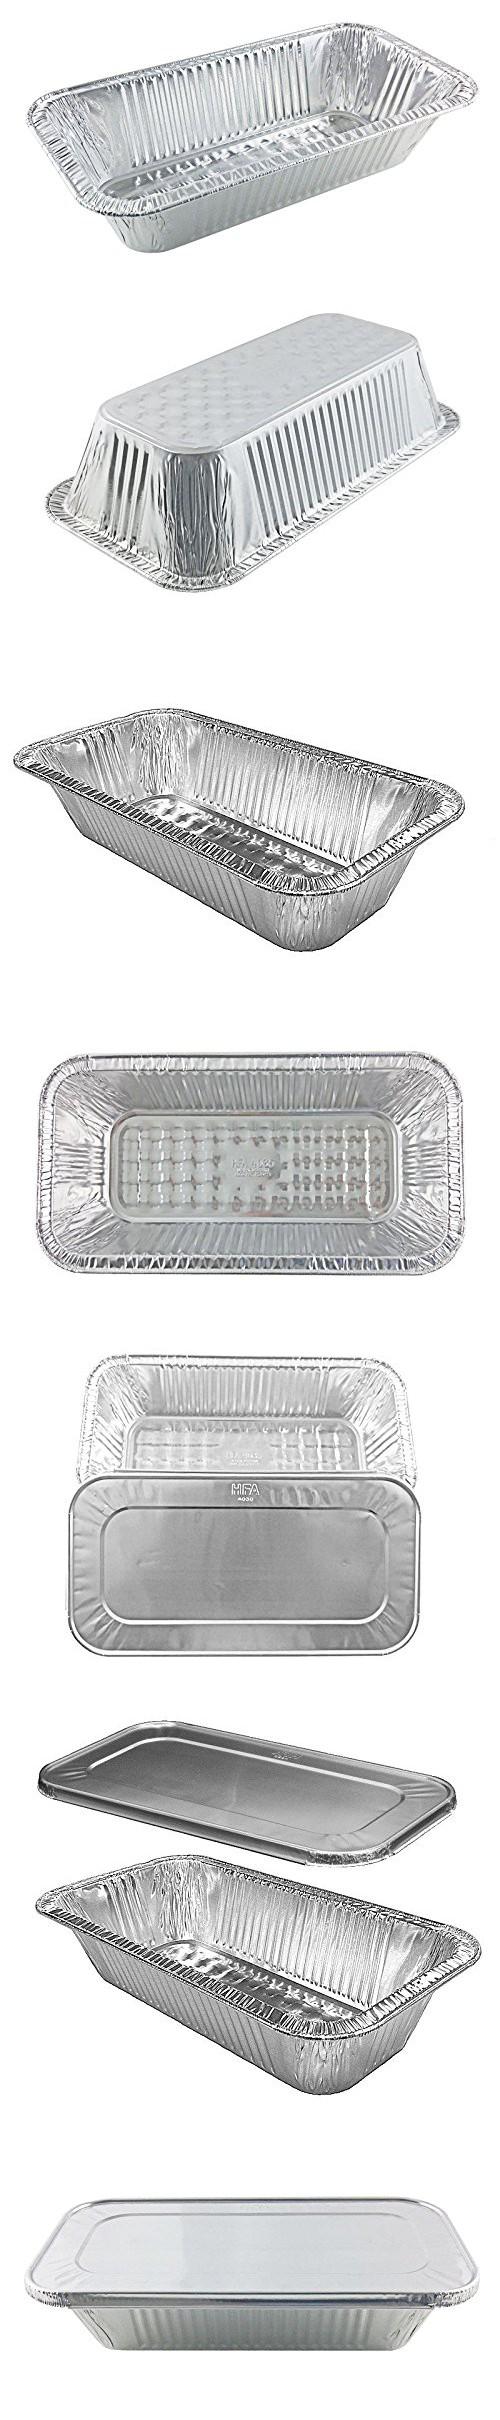 Handi-Foil 1/3 Third-Size TruFit Medium (4 lb.) Steam Table Aluminum Pan w/Lid (pack of 50)